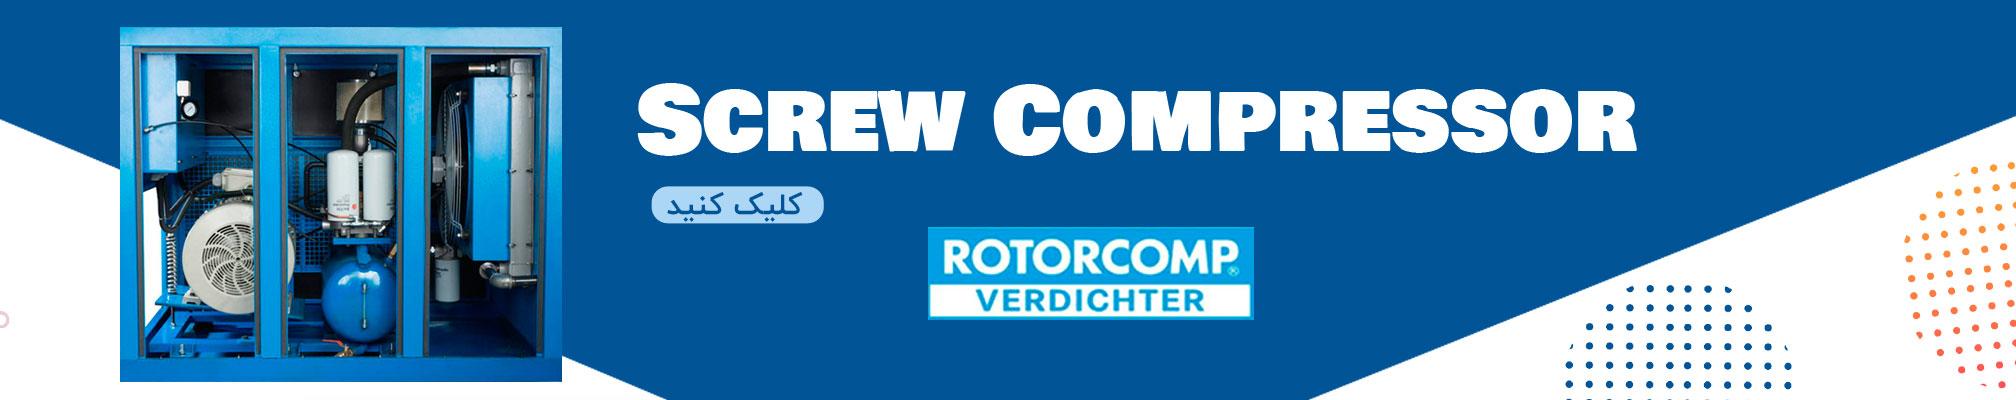 screw-compressor-badro